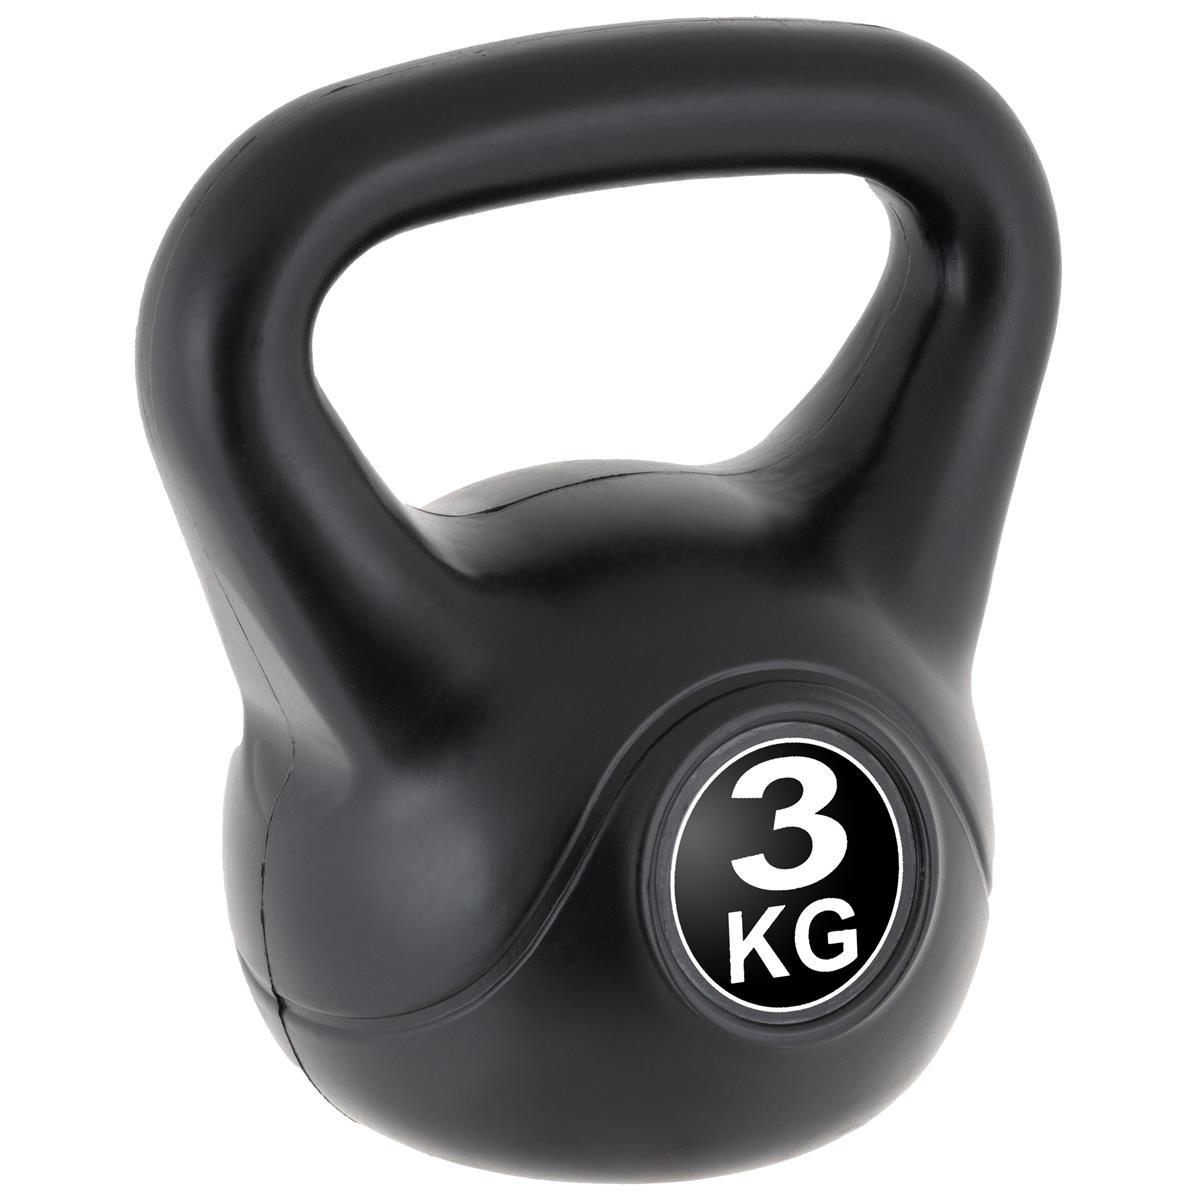 MAXXIVA Kettlebell Kugelhantel 3kg schwarz Krafttraining Fitness Rundhantel